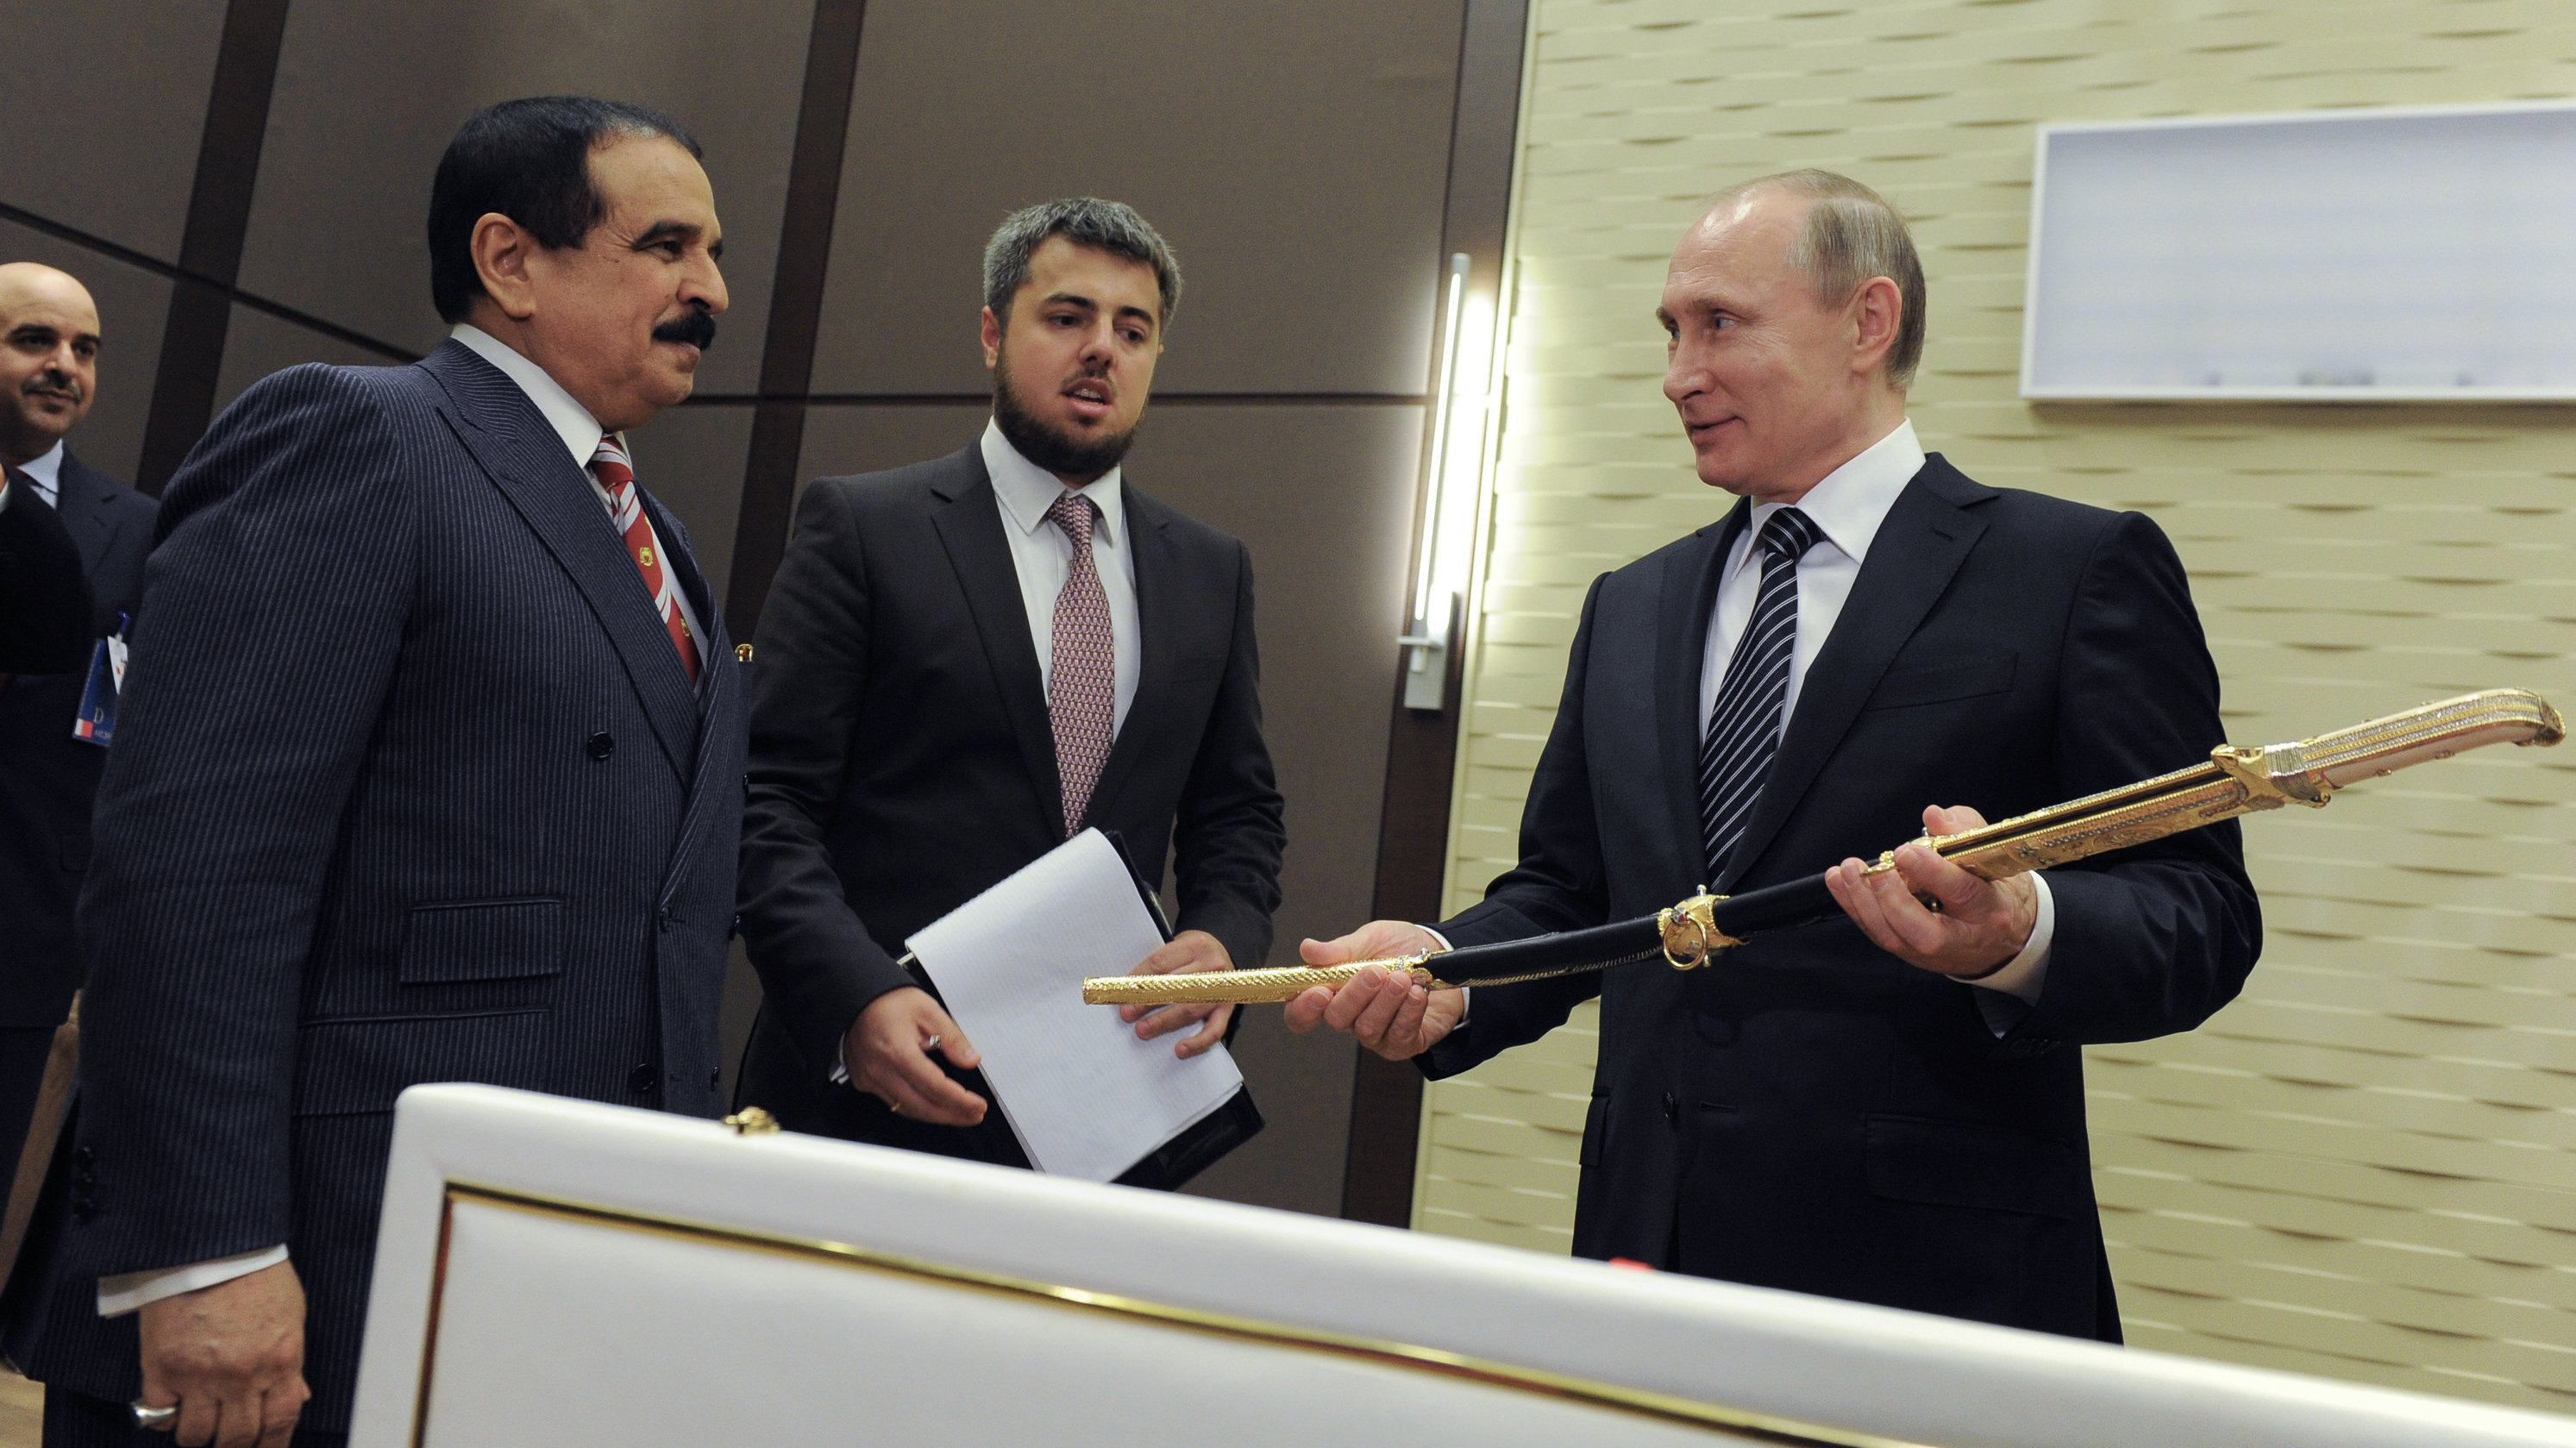 La espada del rey de Bahréin